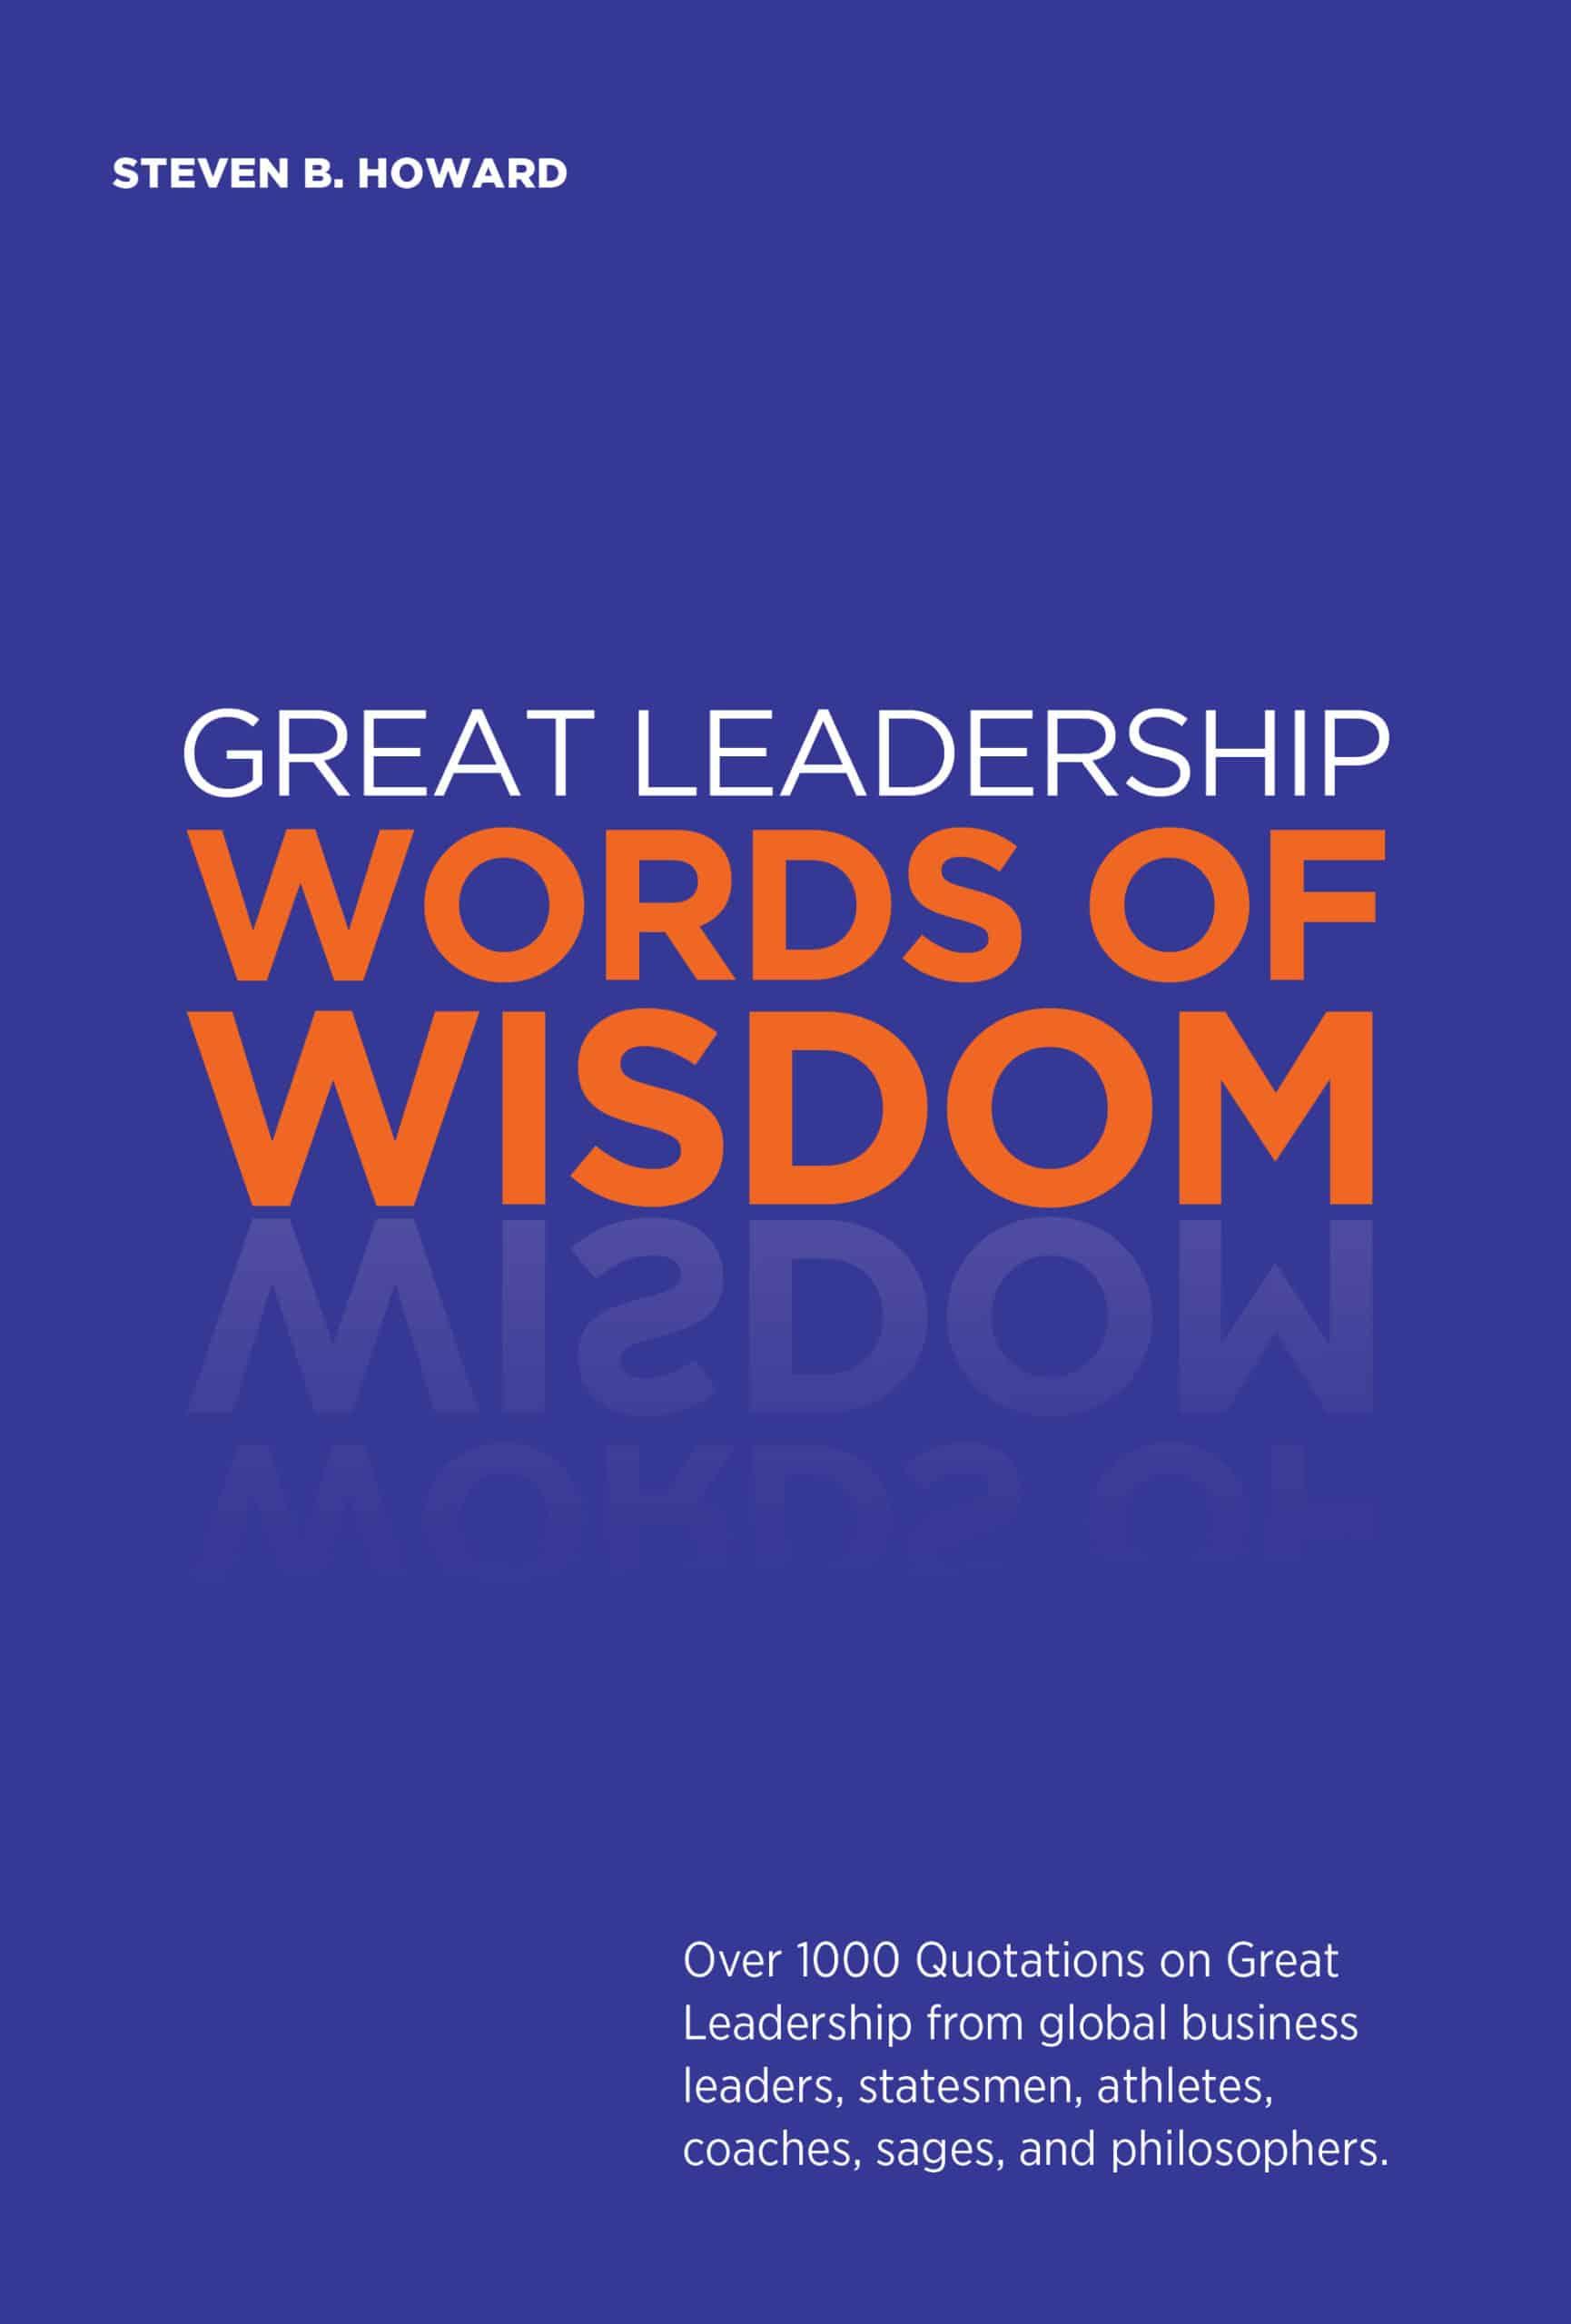 Great Leadership Words of Wisdom by Steven Howard